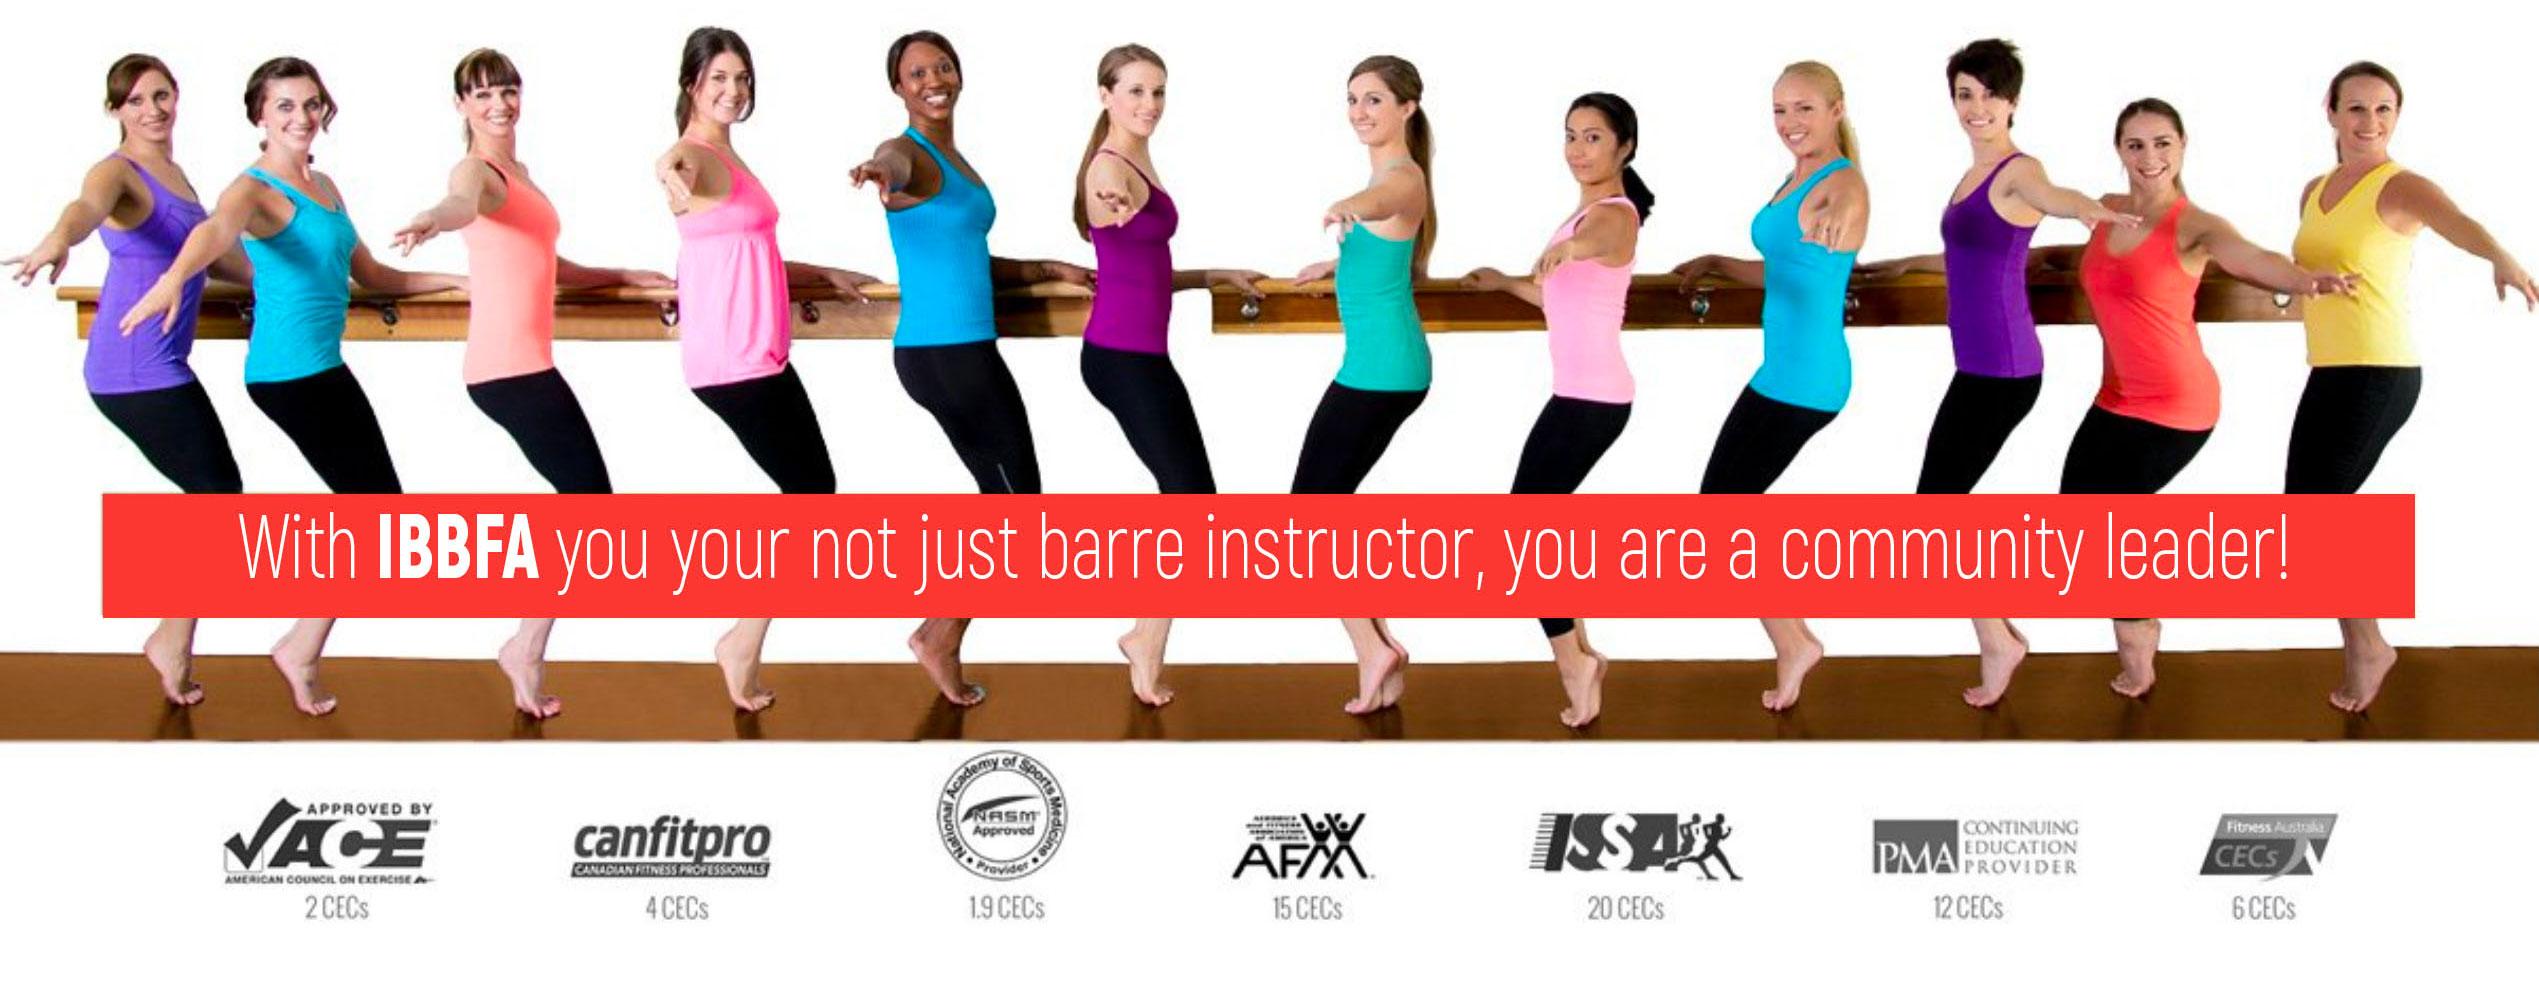 International barre teacher training and instructor certification start your training xflitez Gallery